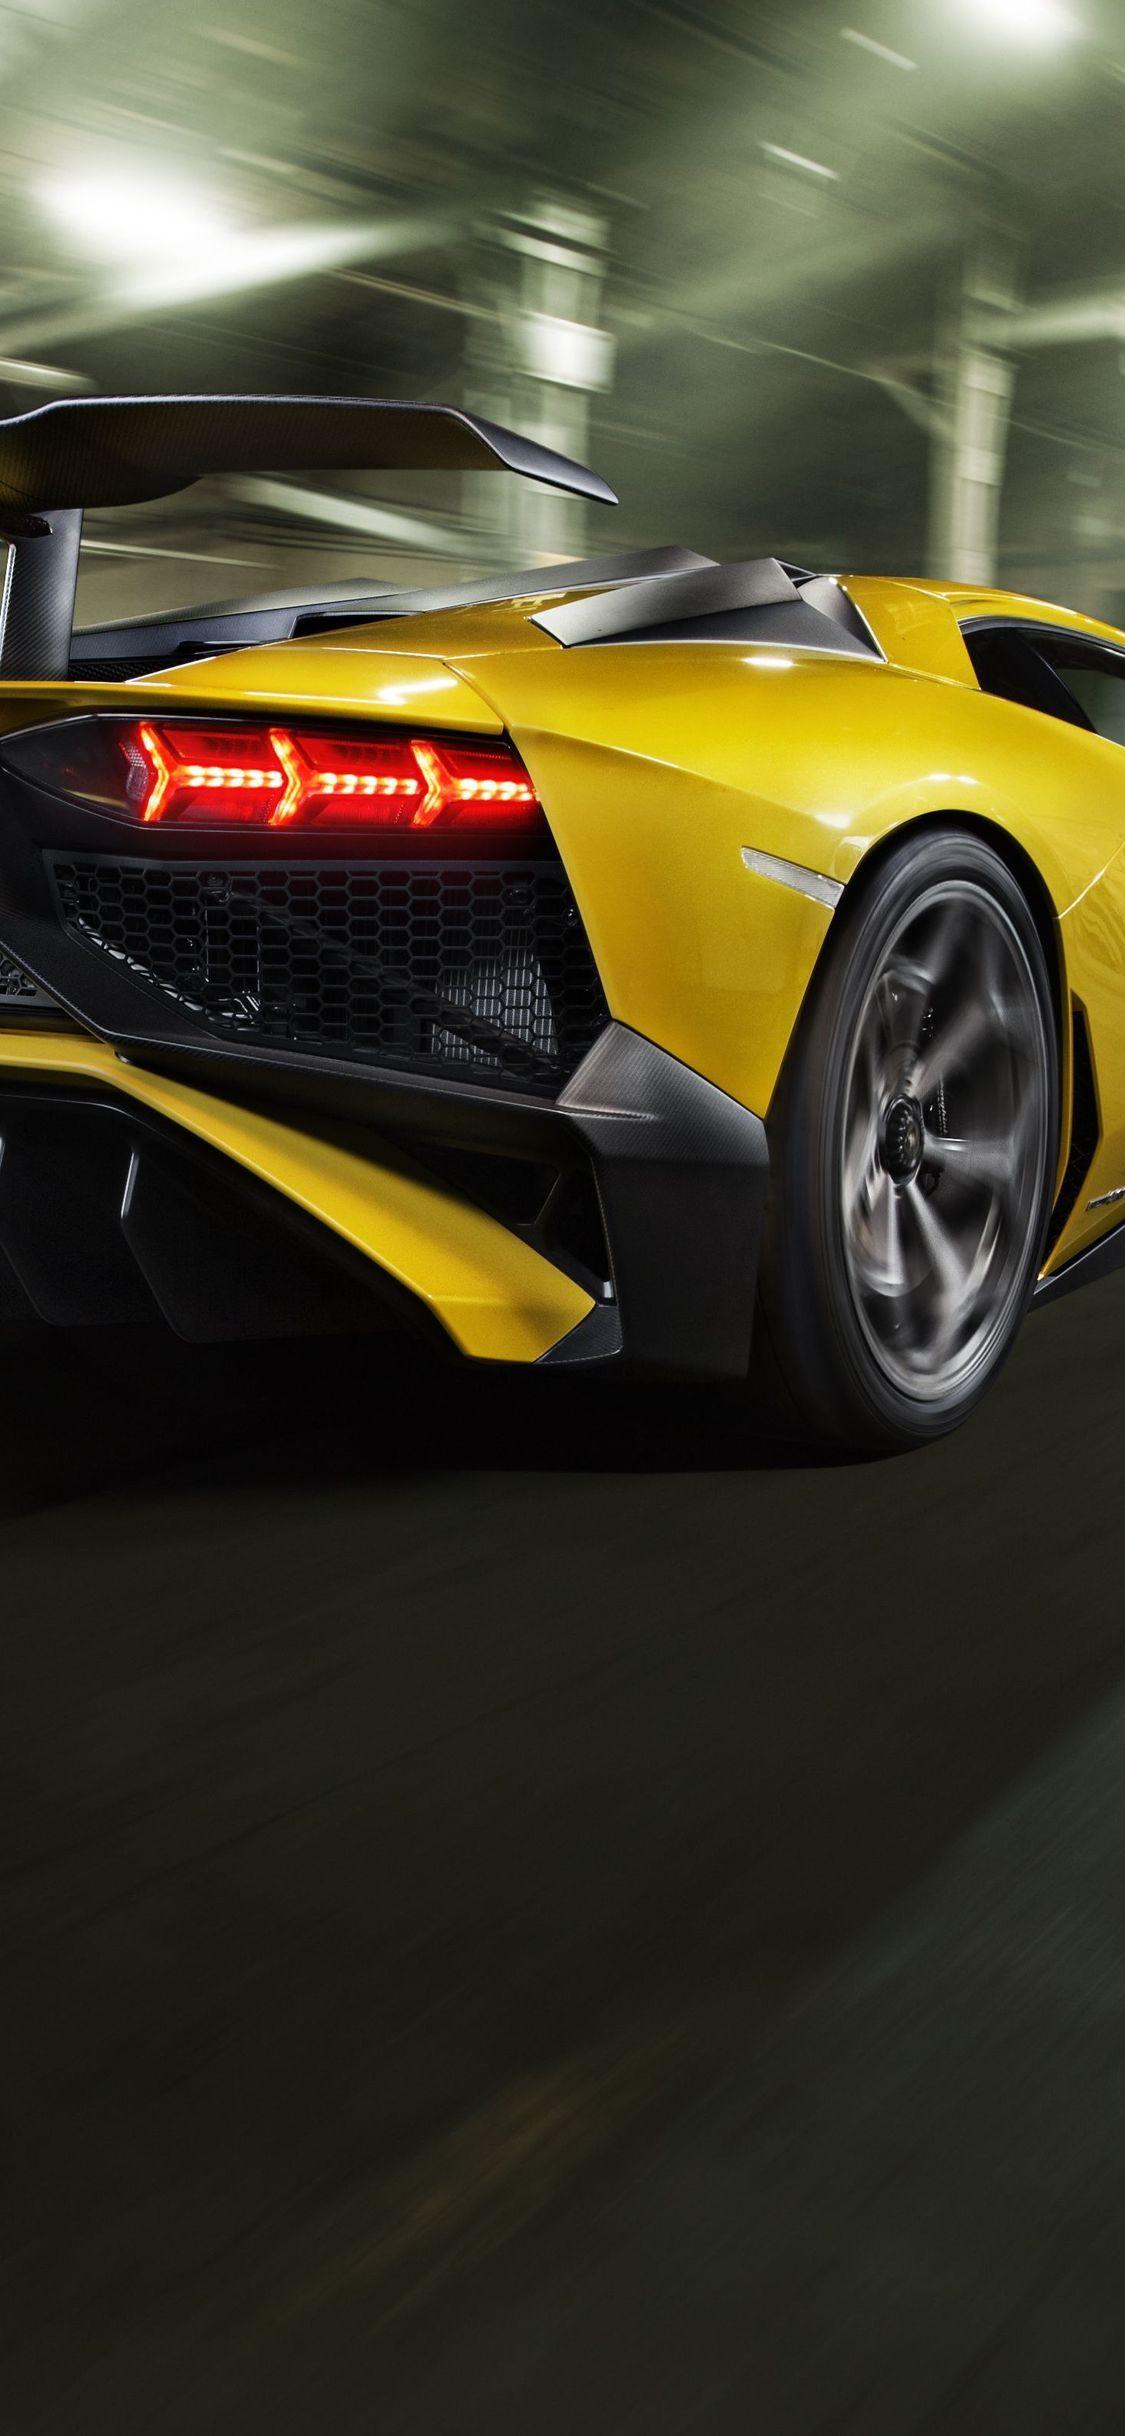 Desktophdwallpaper Org Lamborghini Blue Lamborghini Lamborghini Aventador